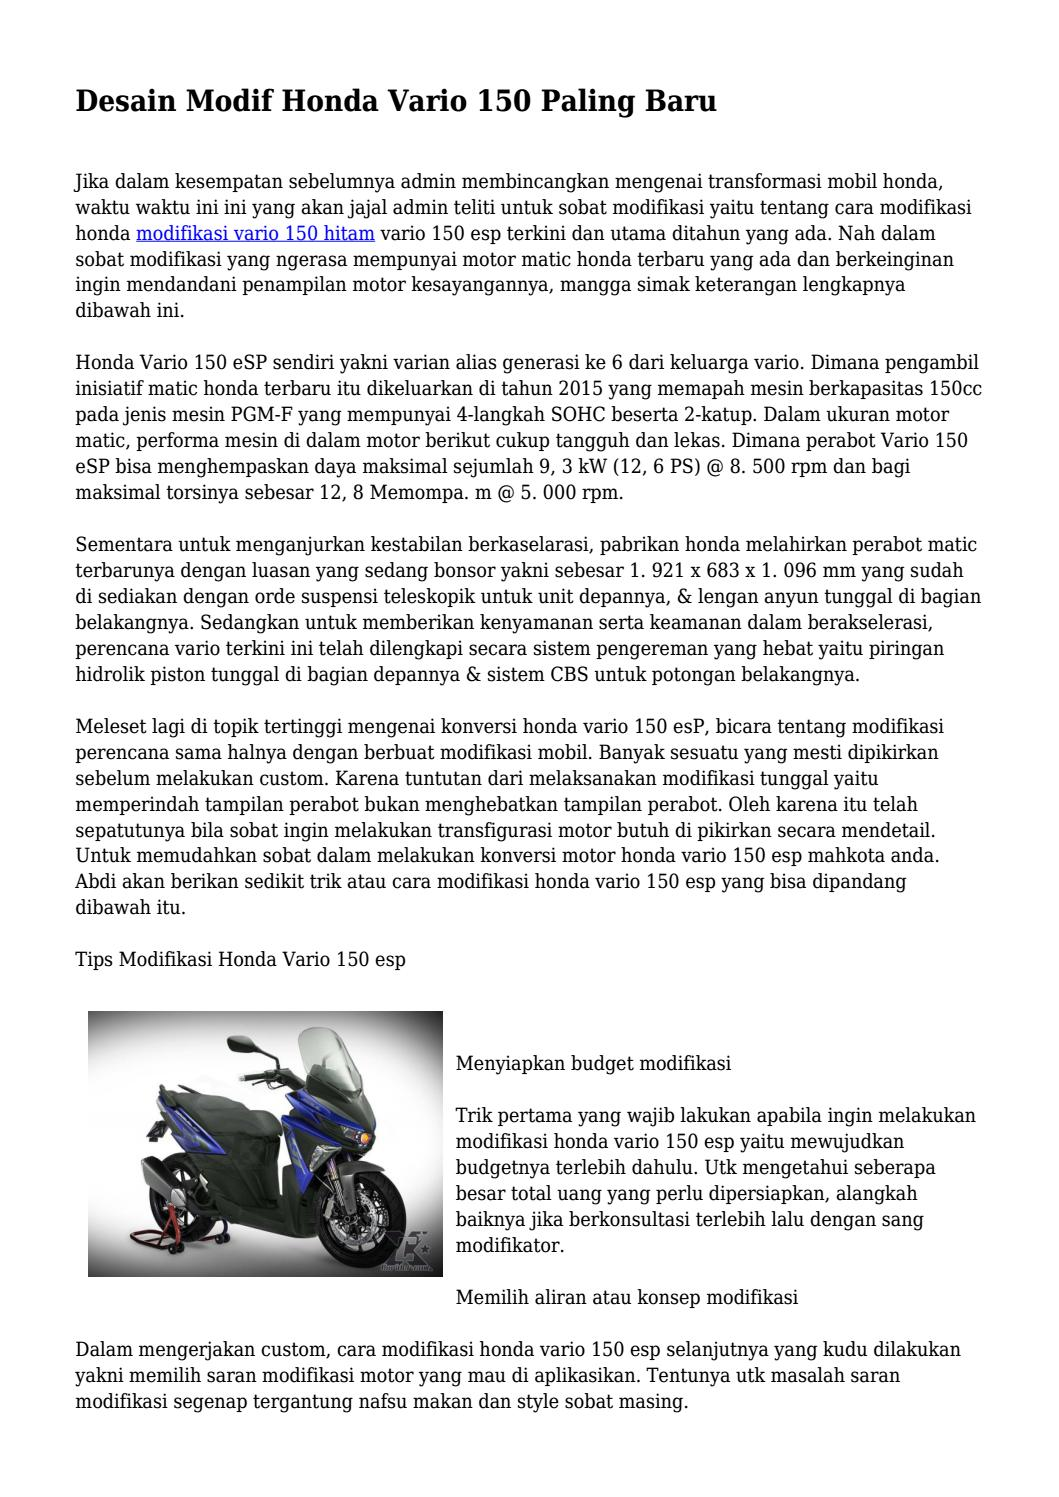 Desain Modif Honda Vario 150 Paling Baru By Superteknoarea Issuu